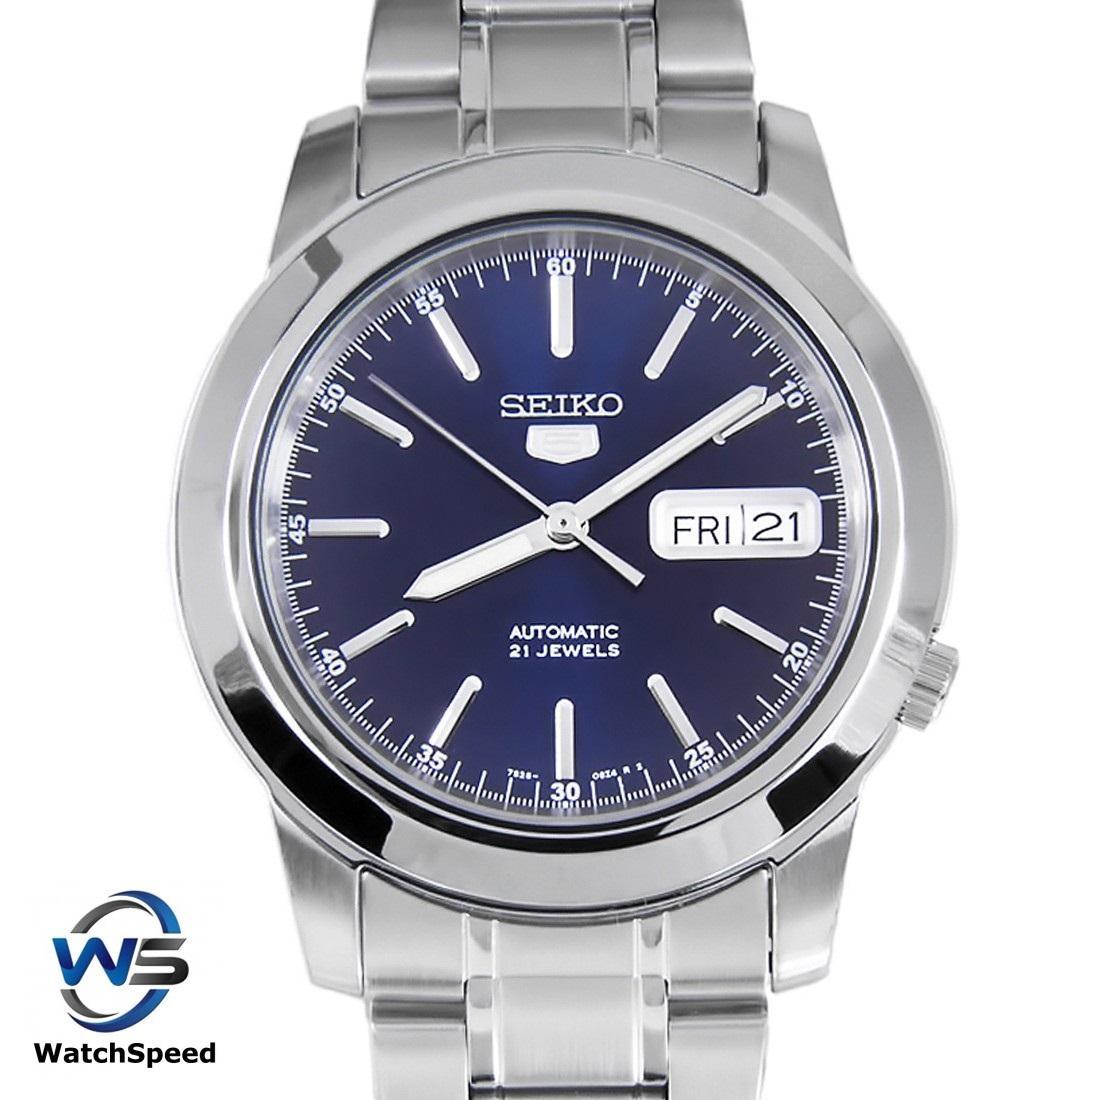 Seiko 5 SNKE51K1 SNKE51K SNKE51 Automatic Blue Dial Stainless Steel Men's  Watch